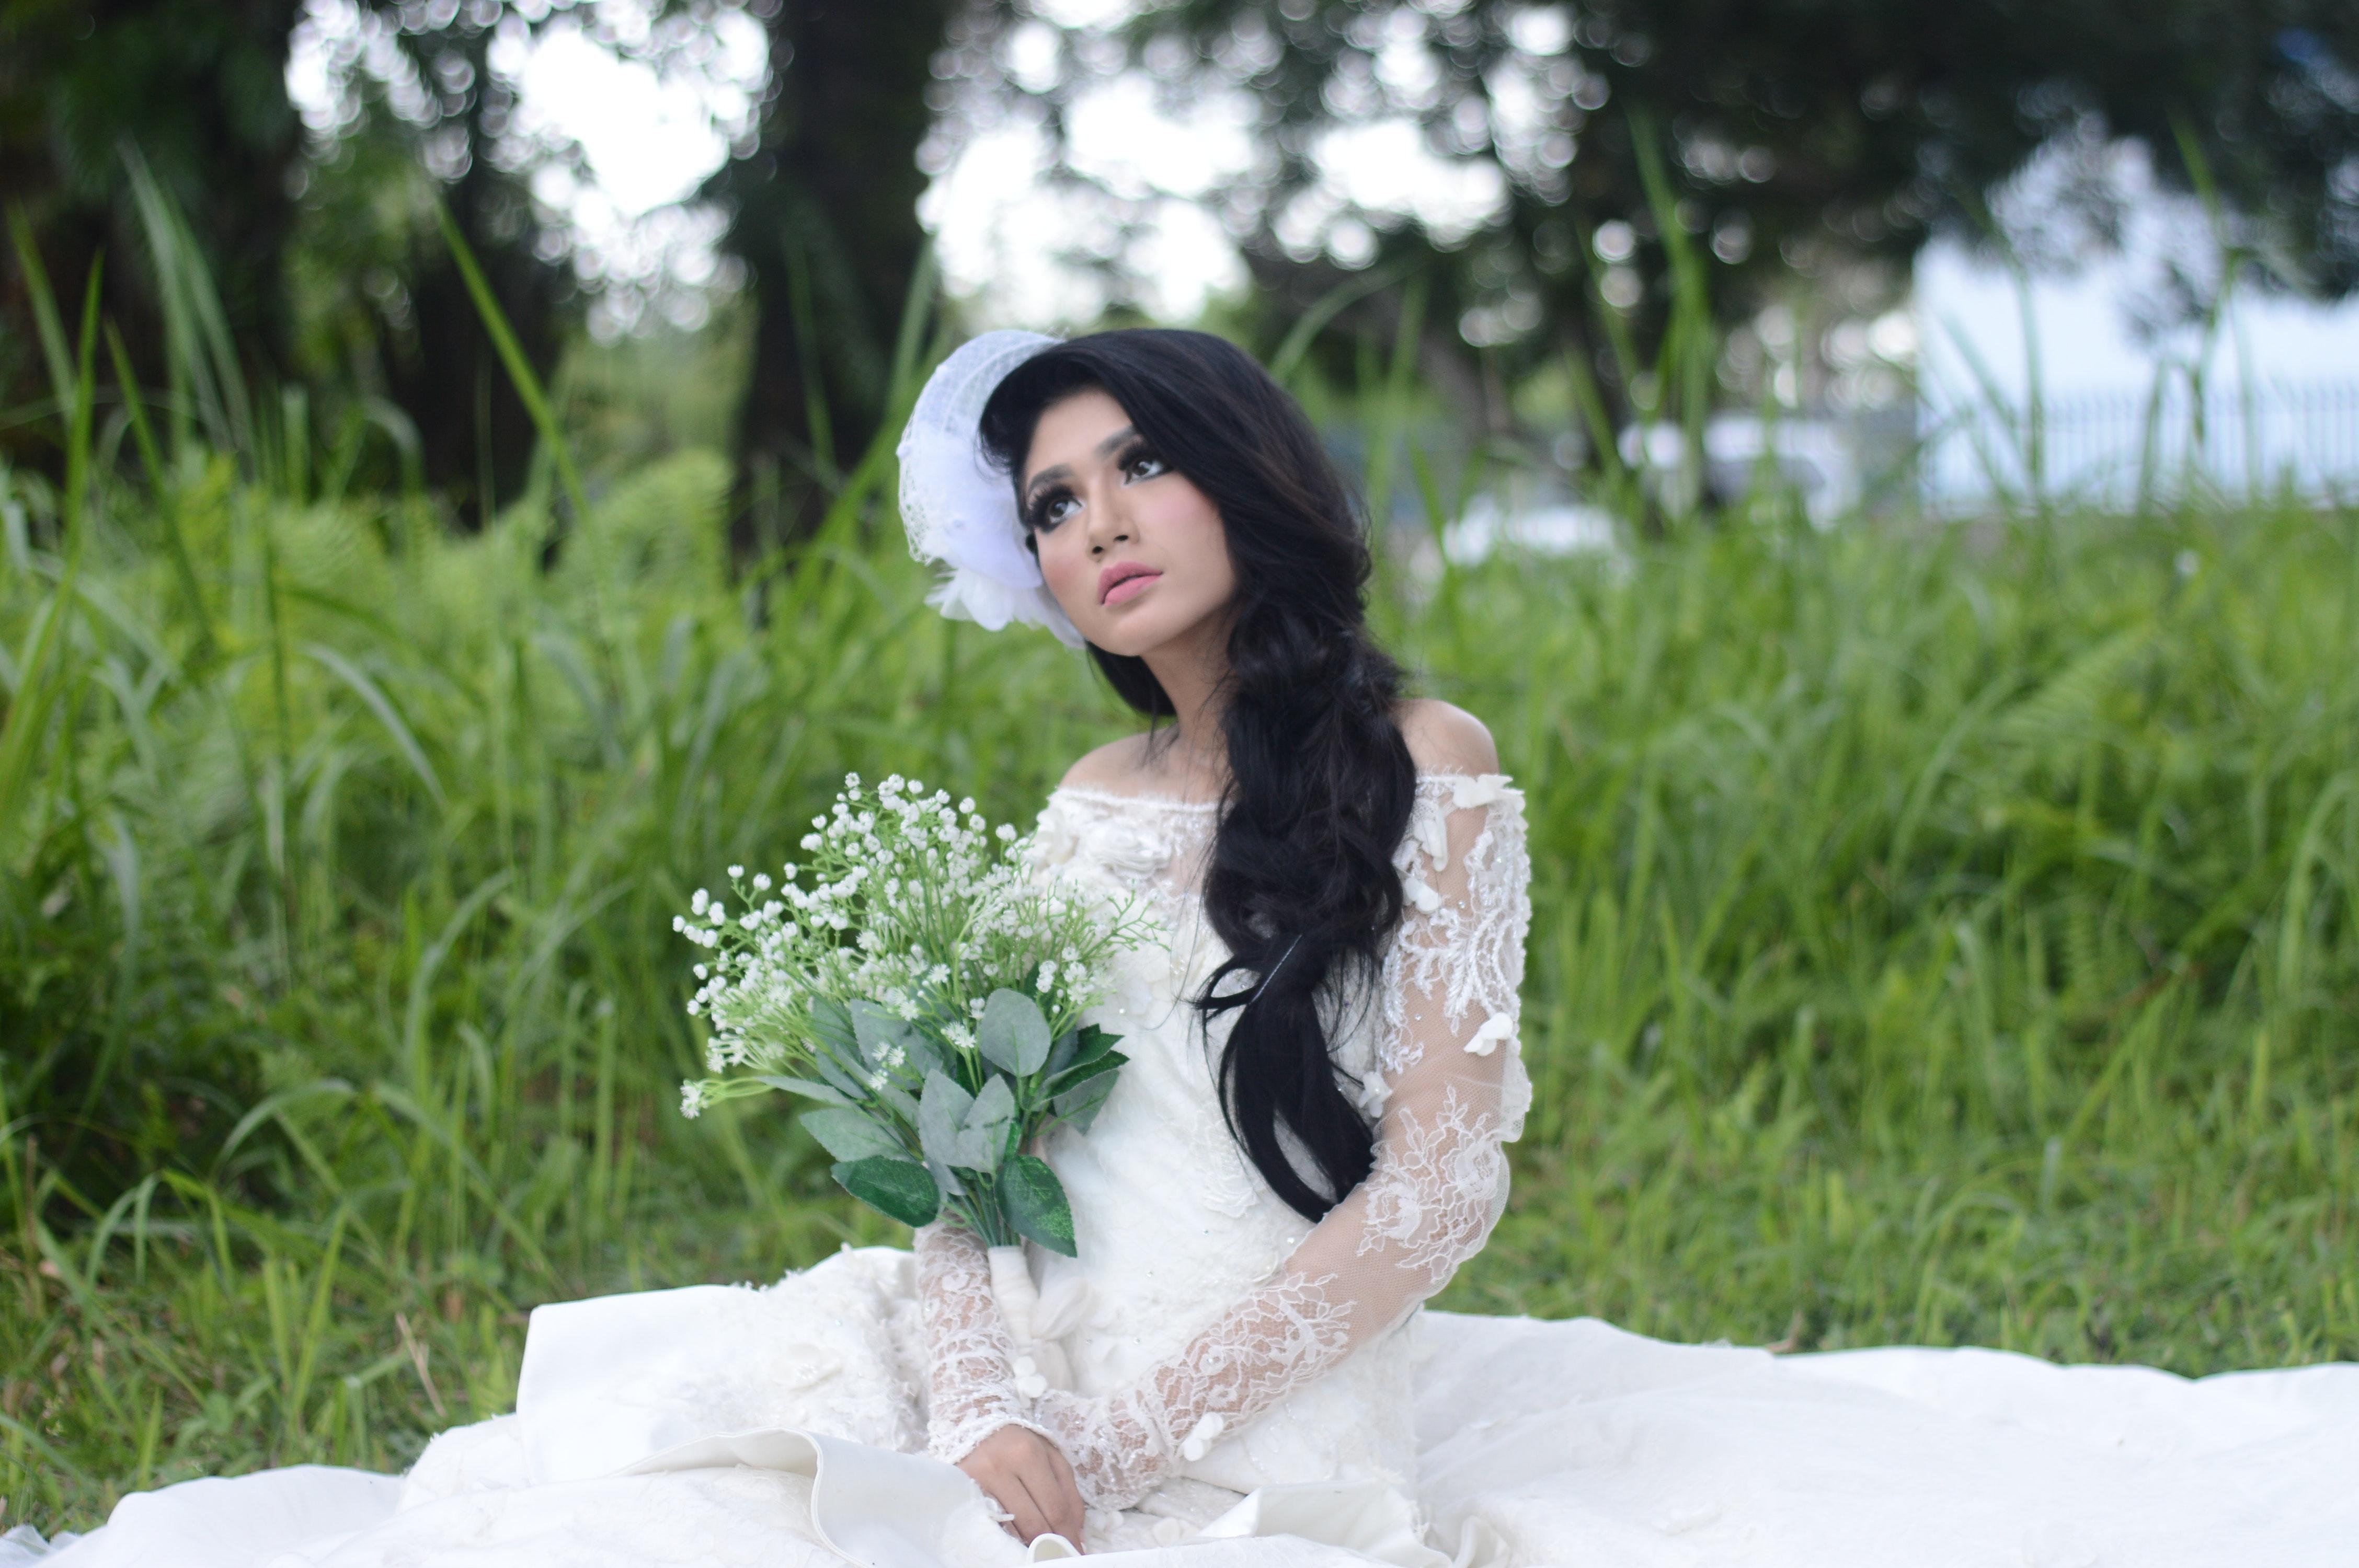 Free photo: Woman Wearing of White Off-shoulder Bridal Dress - model ...